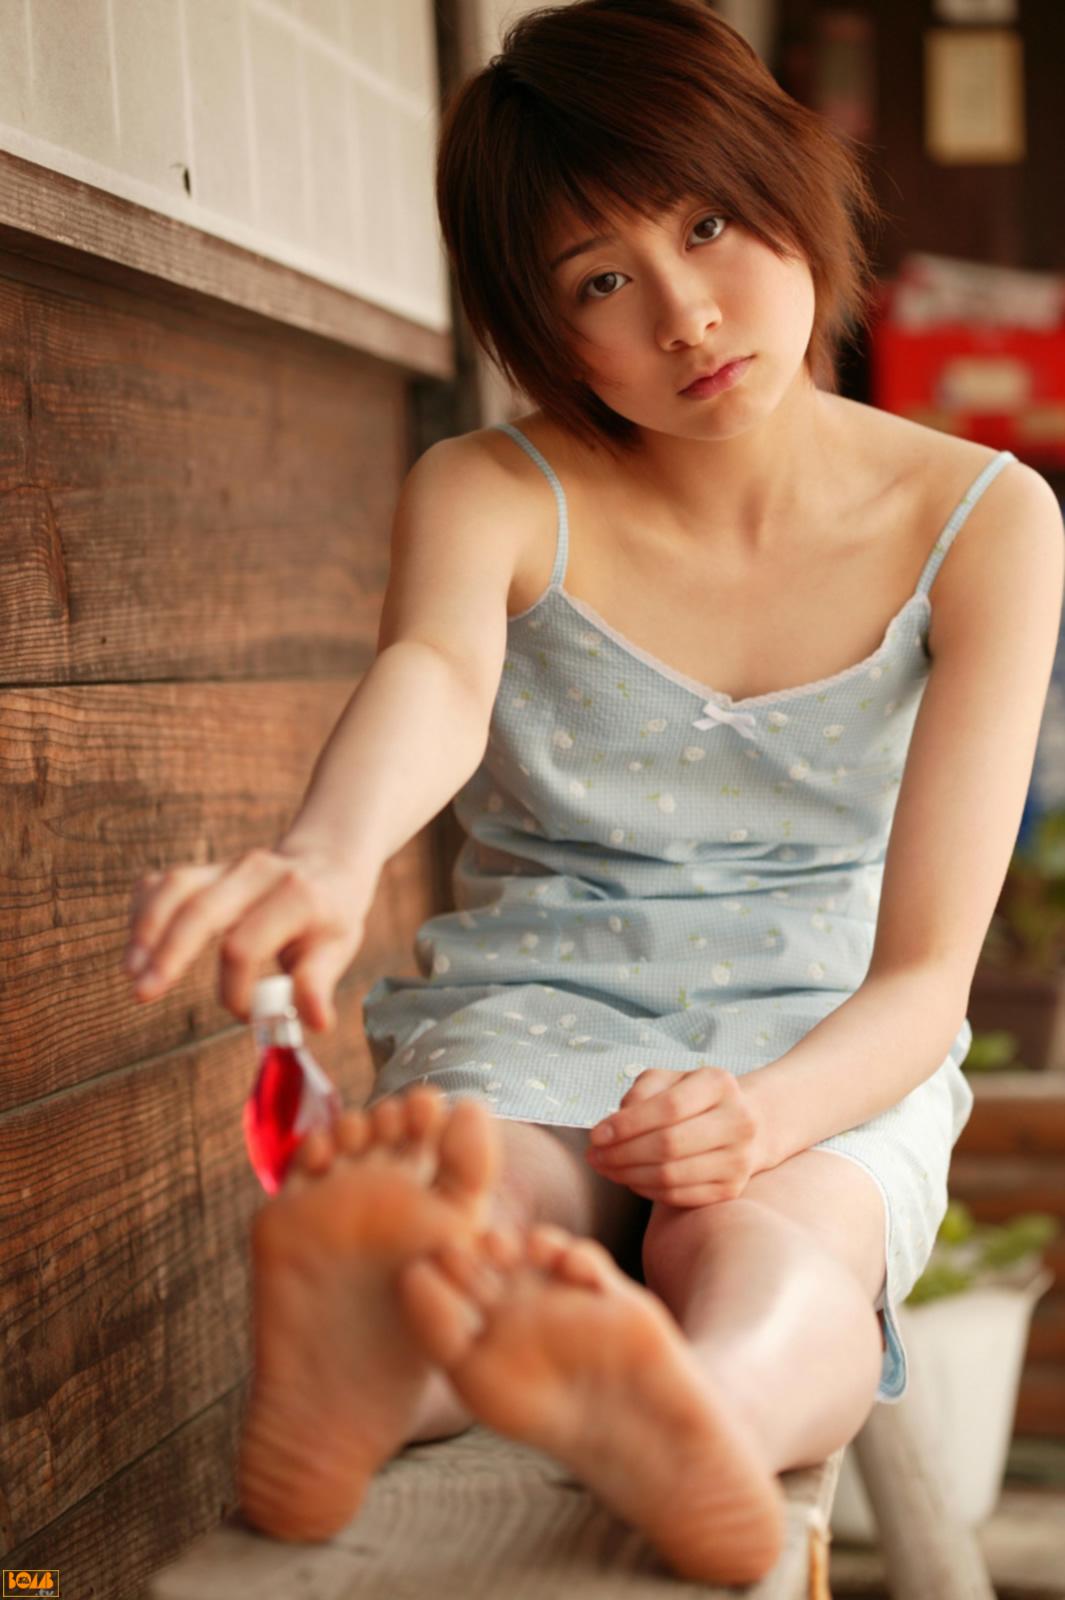 Chihiro Ôtsuka's Feet